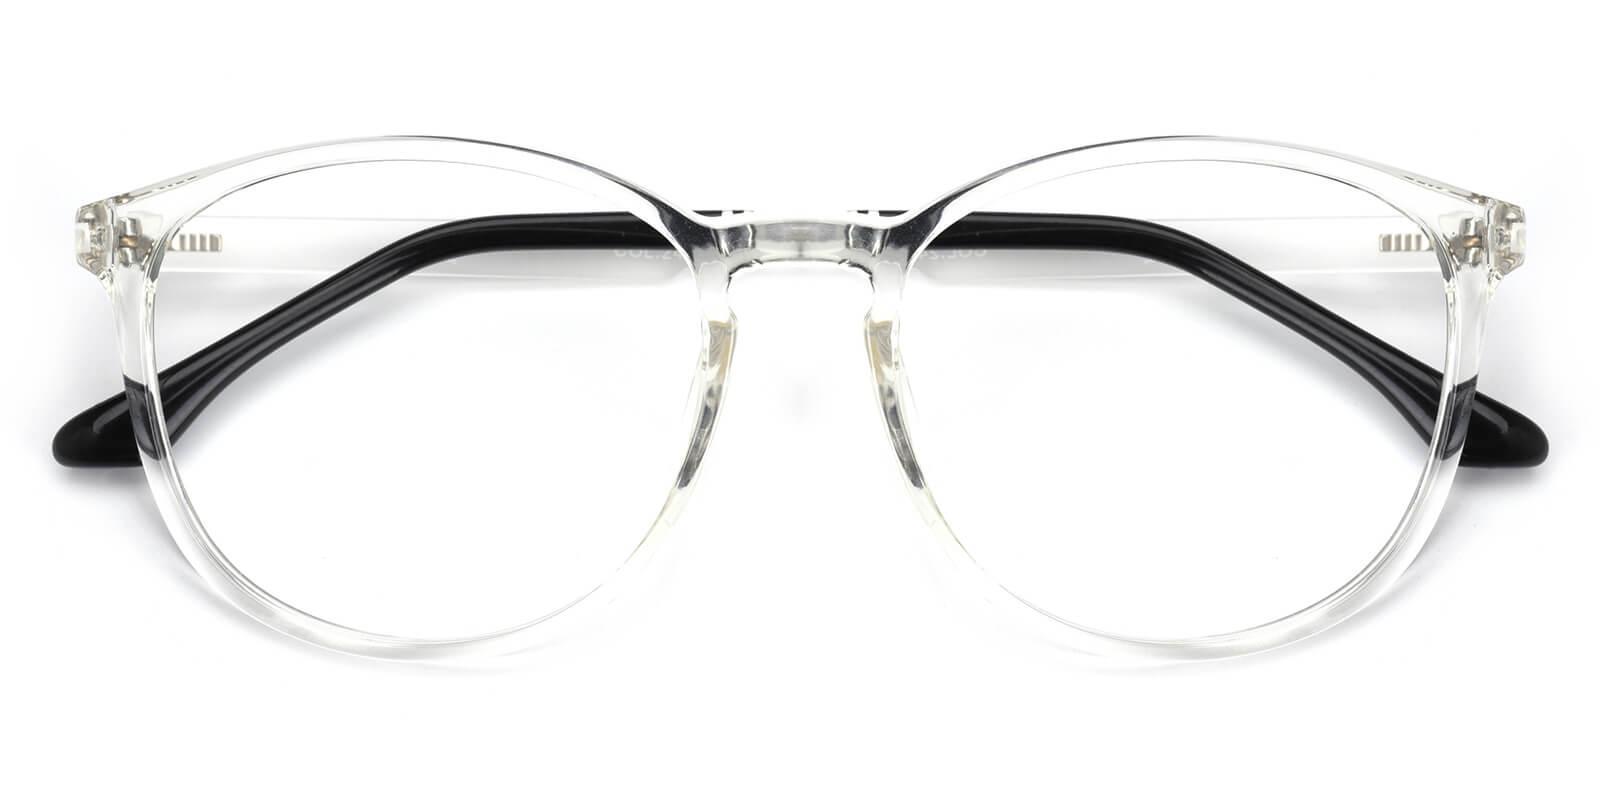 Vincily-Translucent-Round-TR-Eyeglasses-detail